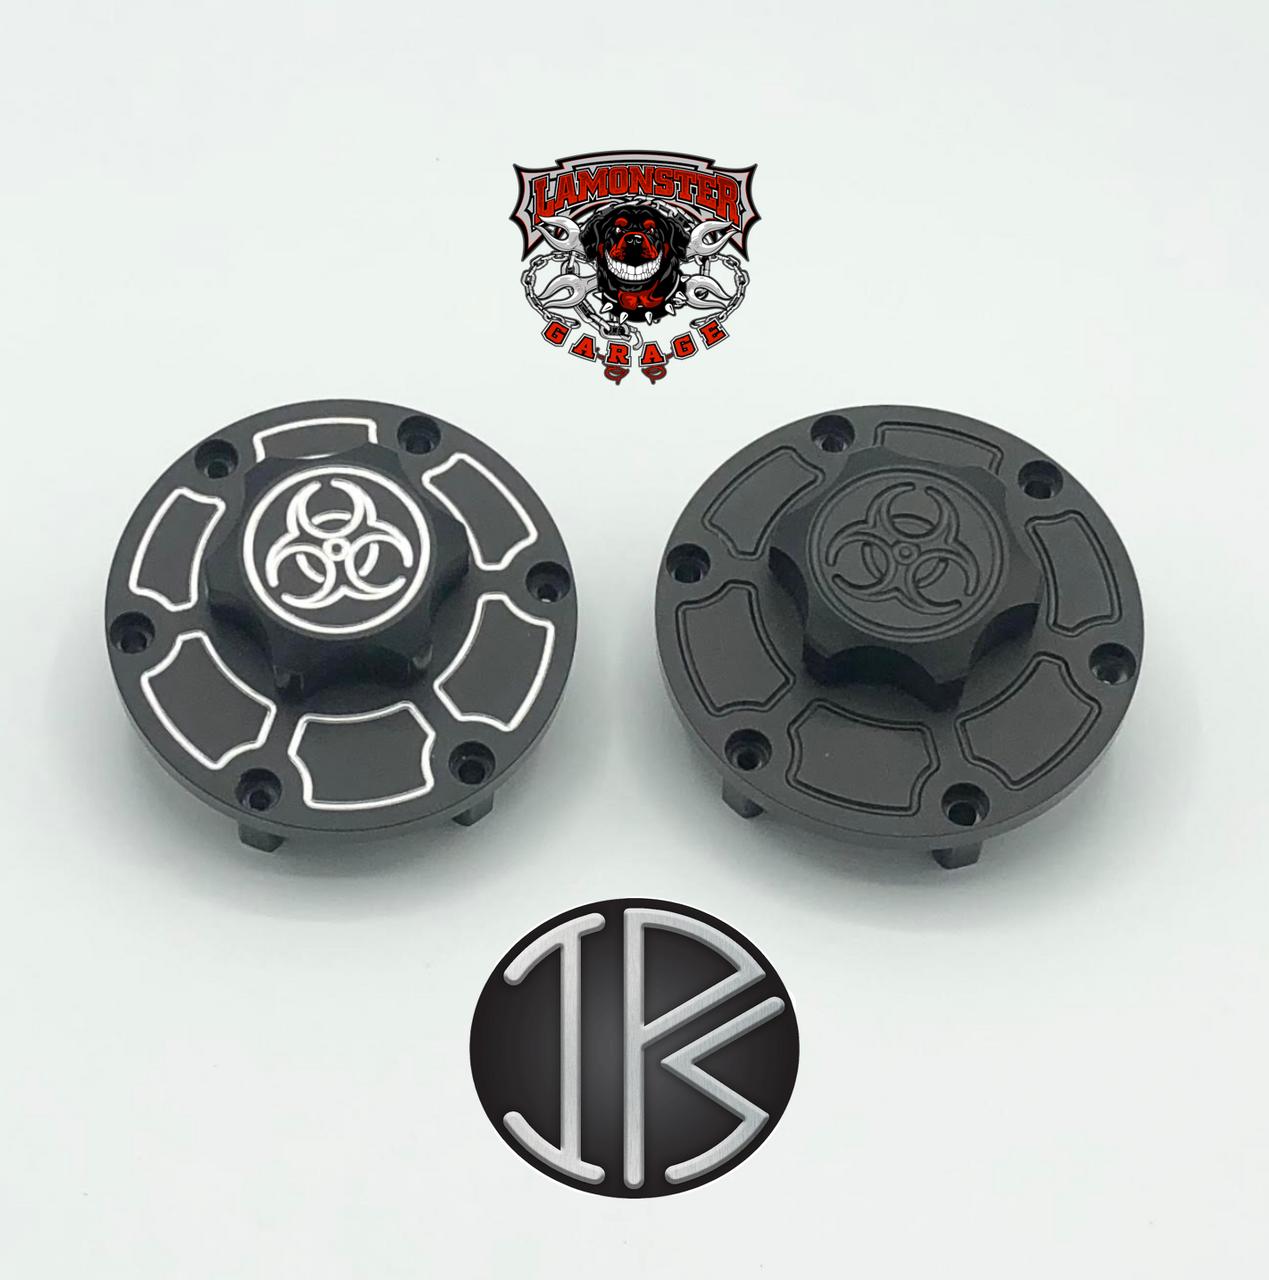 Lamonster IPS F3 Keyless Fuel Cap Assembly (LG-1095A, LG-1095B ) Fits all Can-Am Spyder F3 Models. F3, F3-S, F3-T, F3-LTD